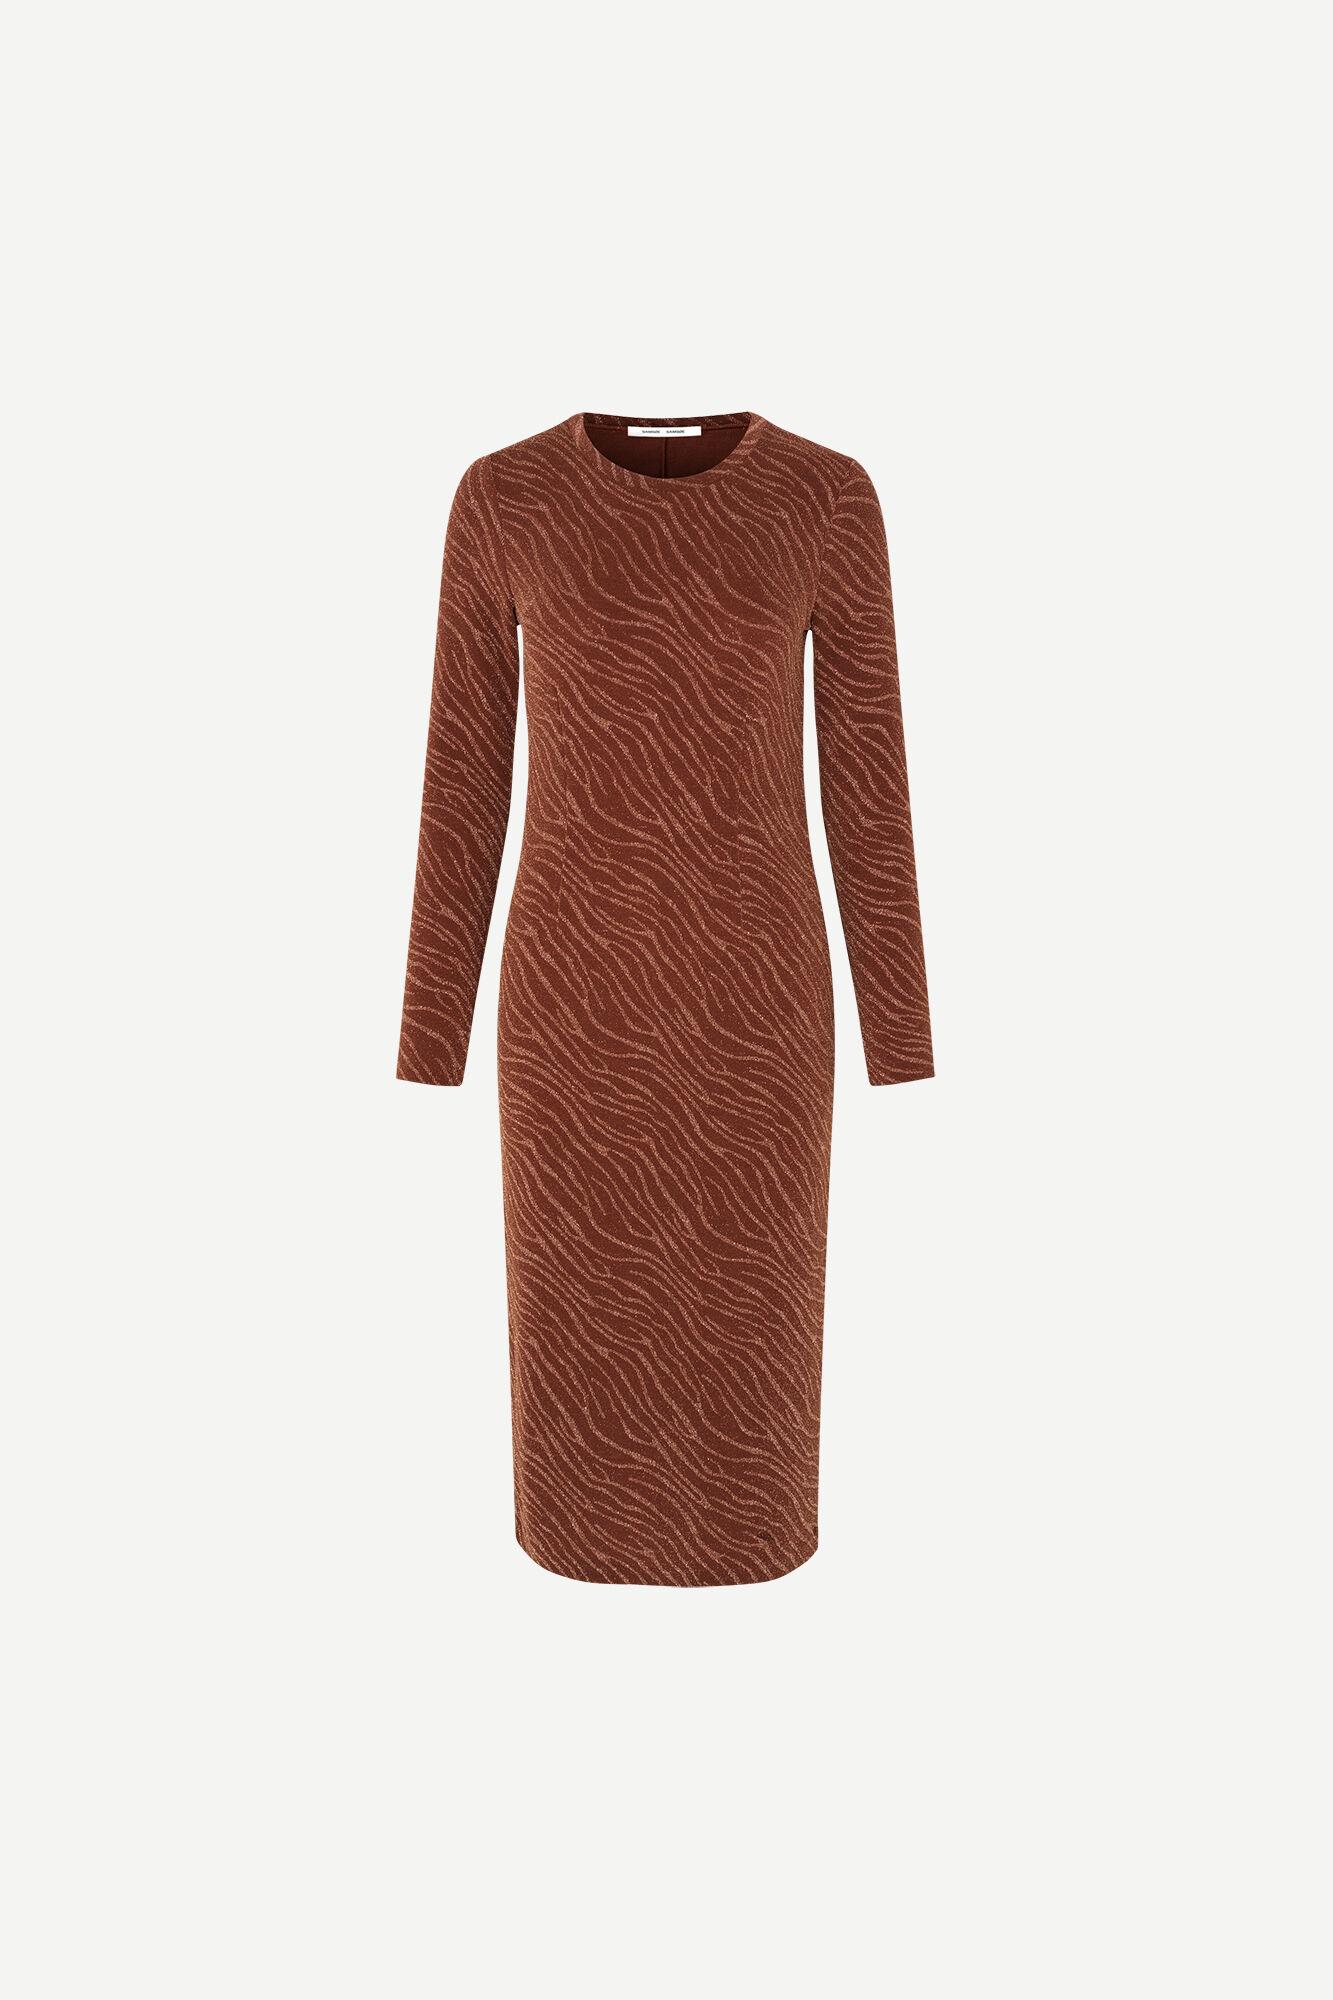 Jenara dress 12821